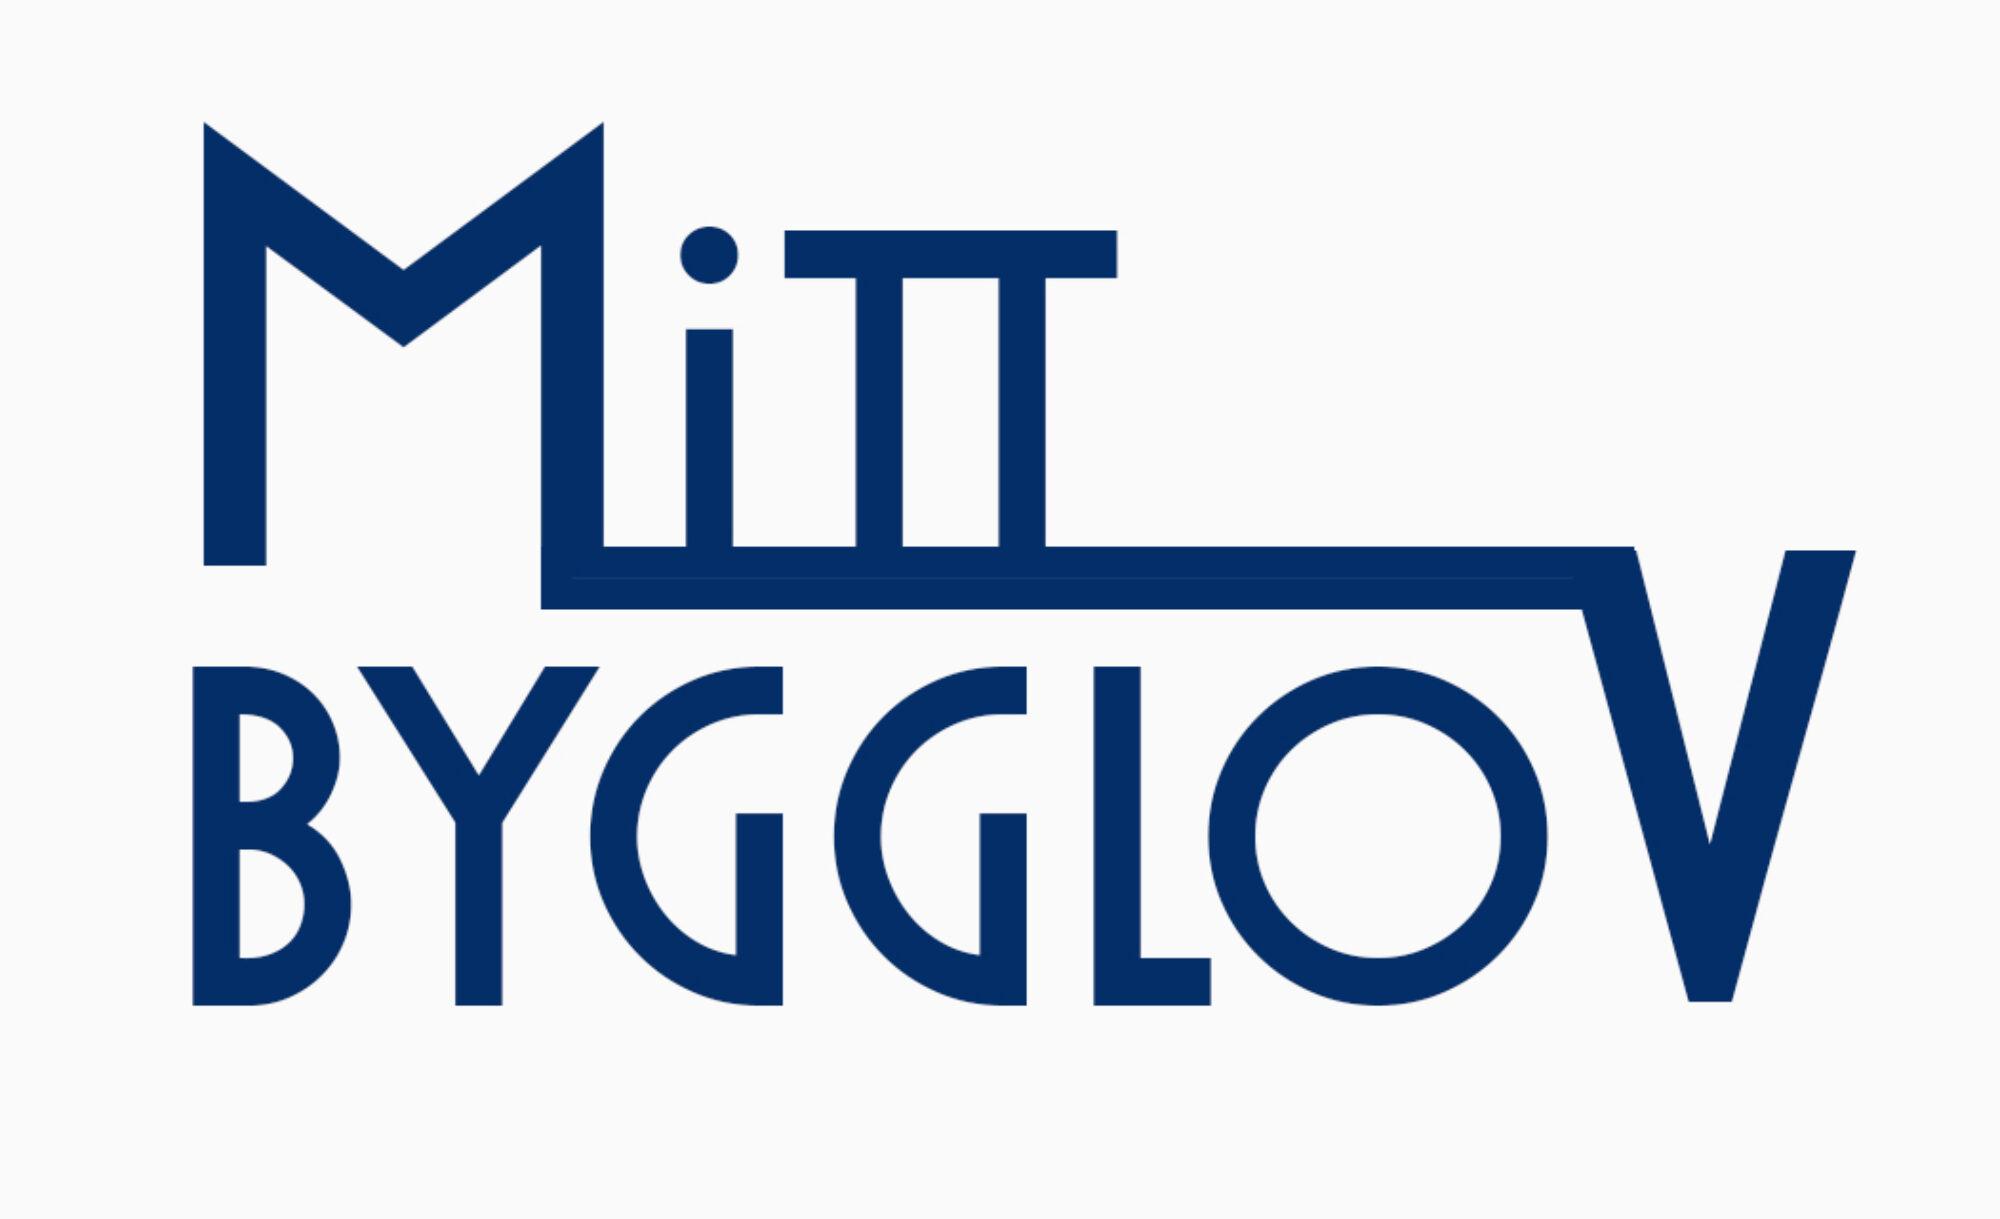 MittBygglov